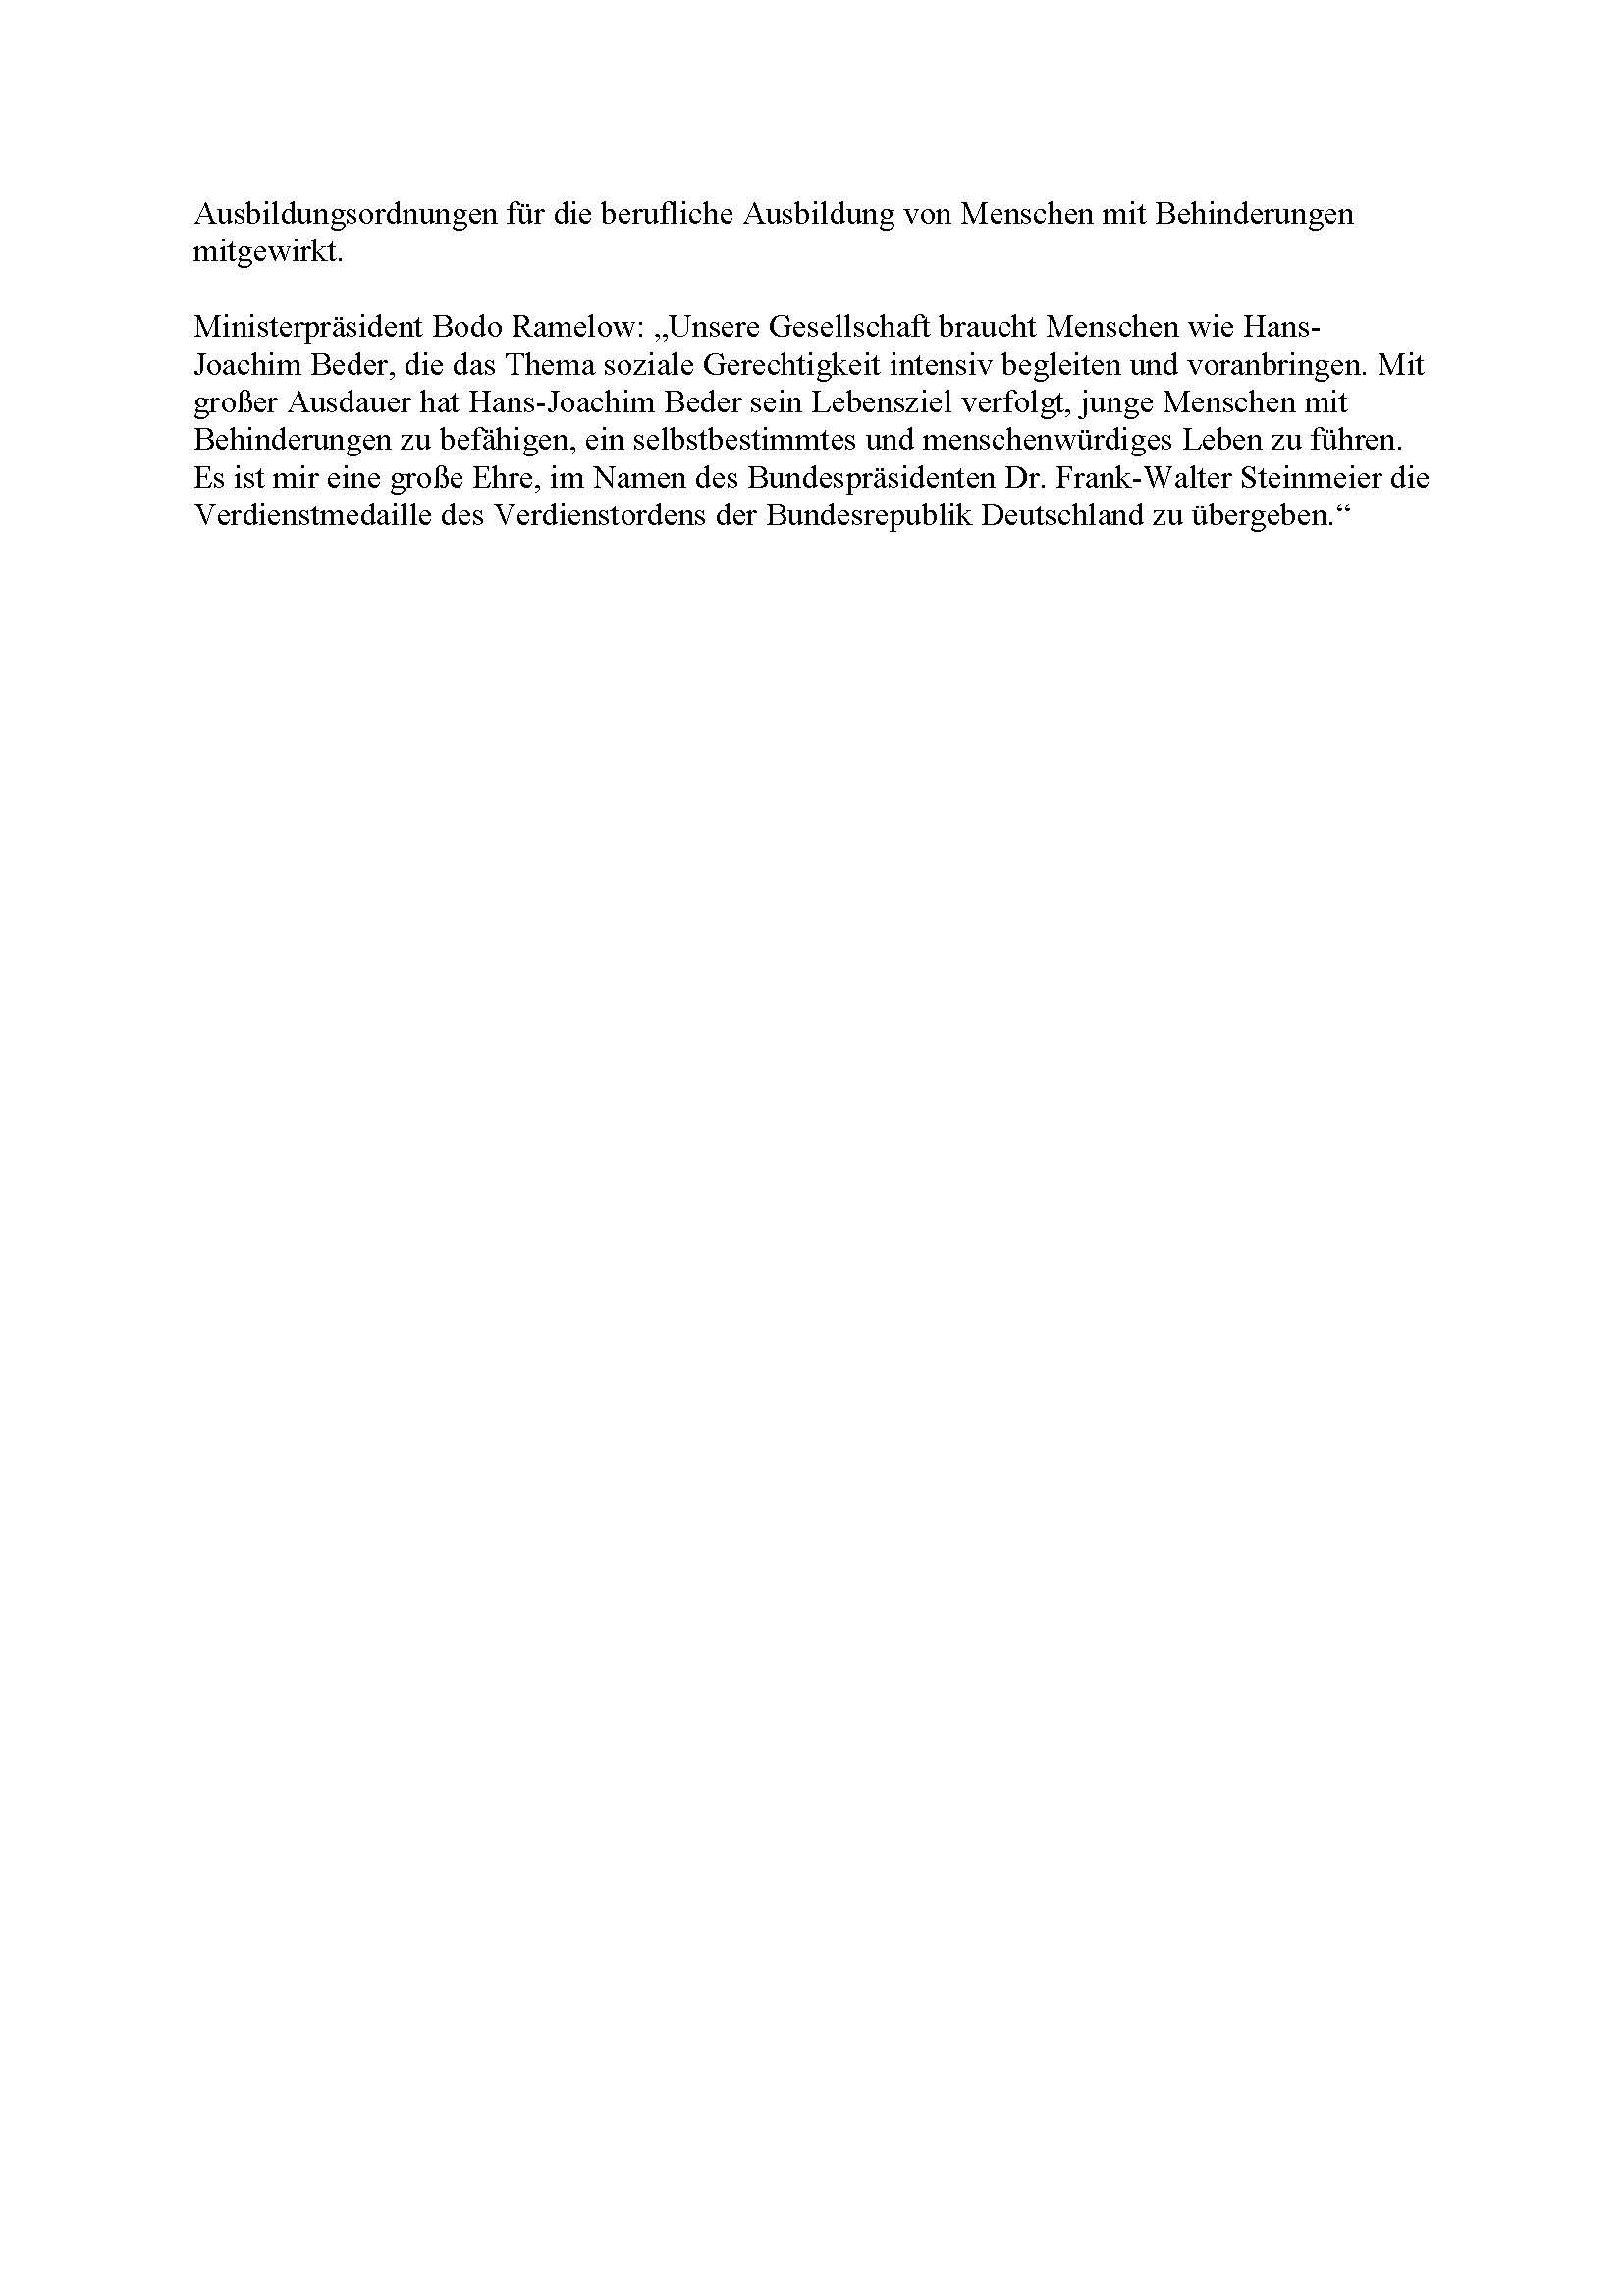 Text der Staatsklanzlei